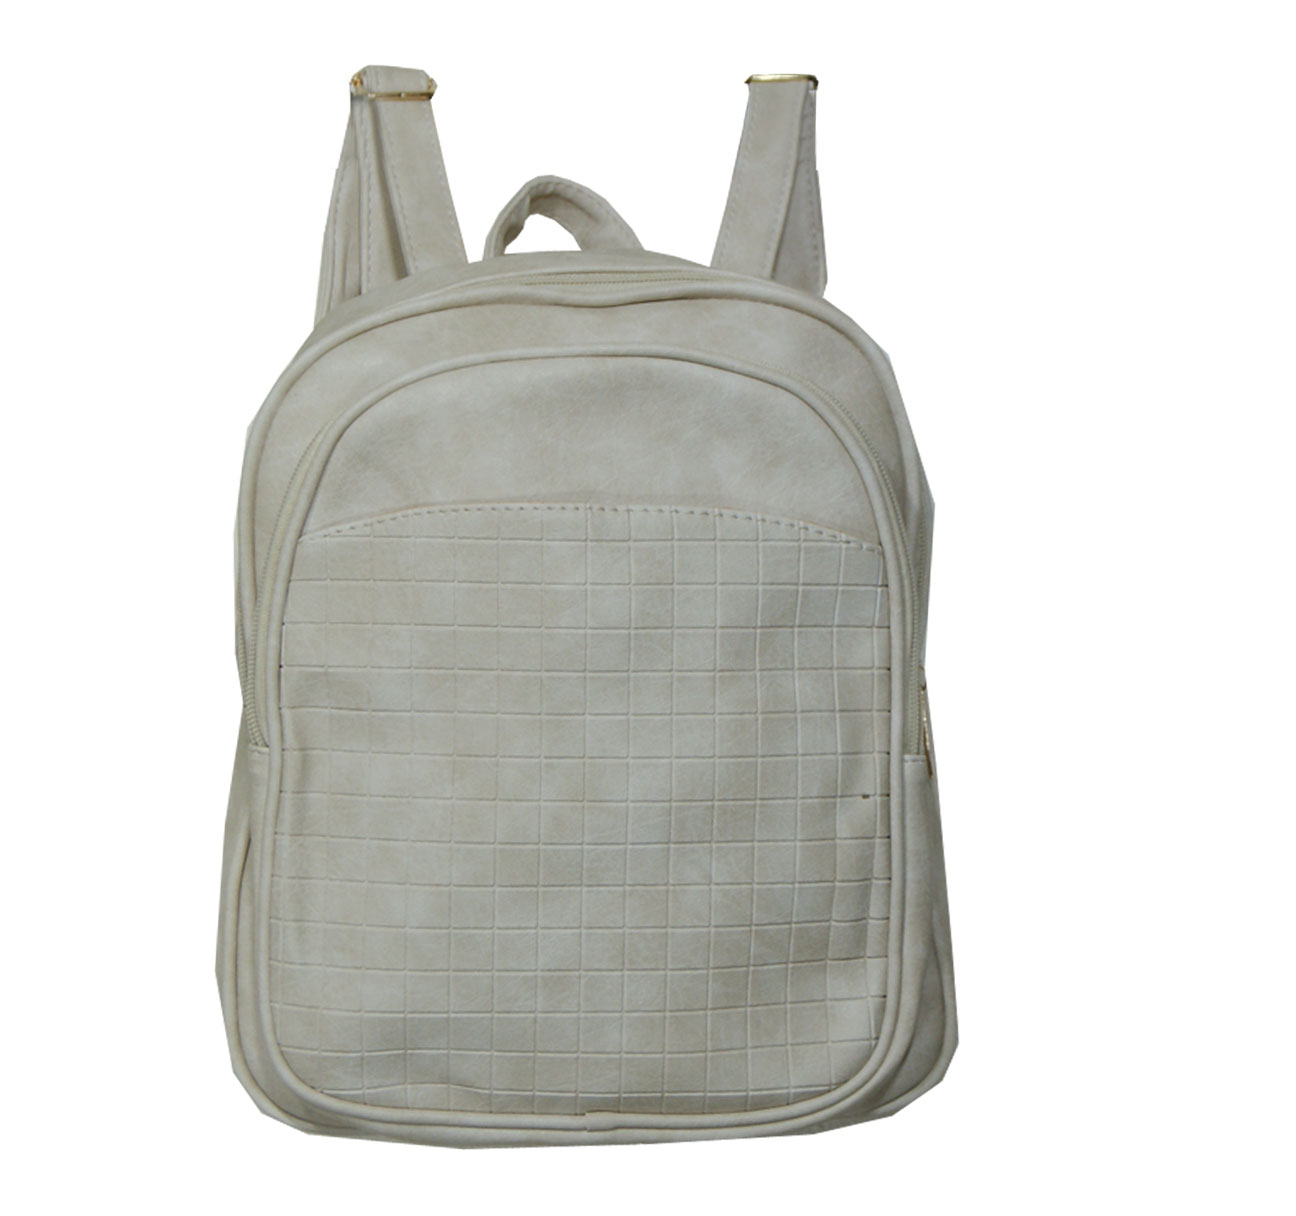 Backpack No 632 - Ιβουάρ (Silvio 632)